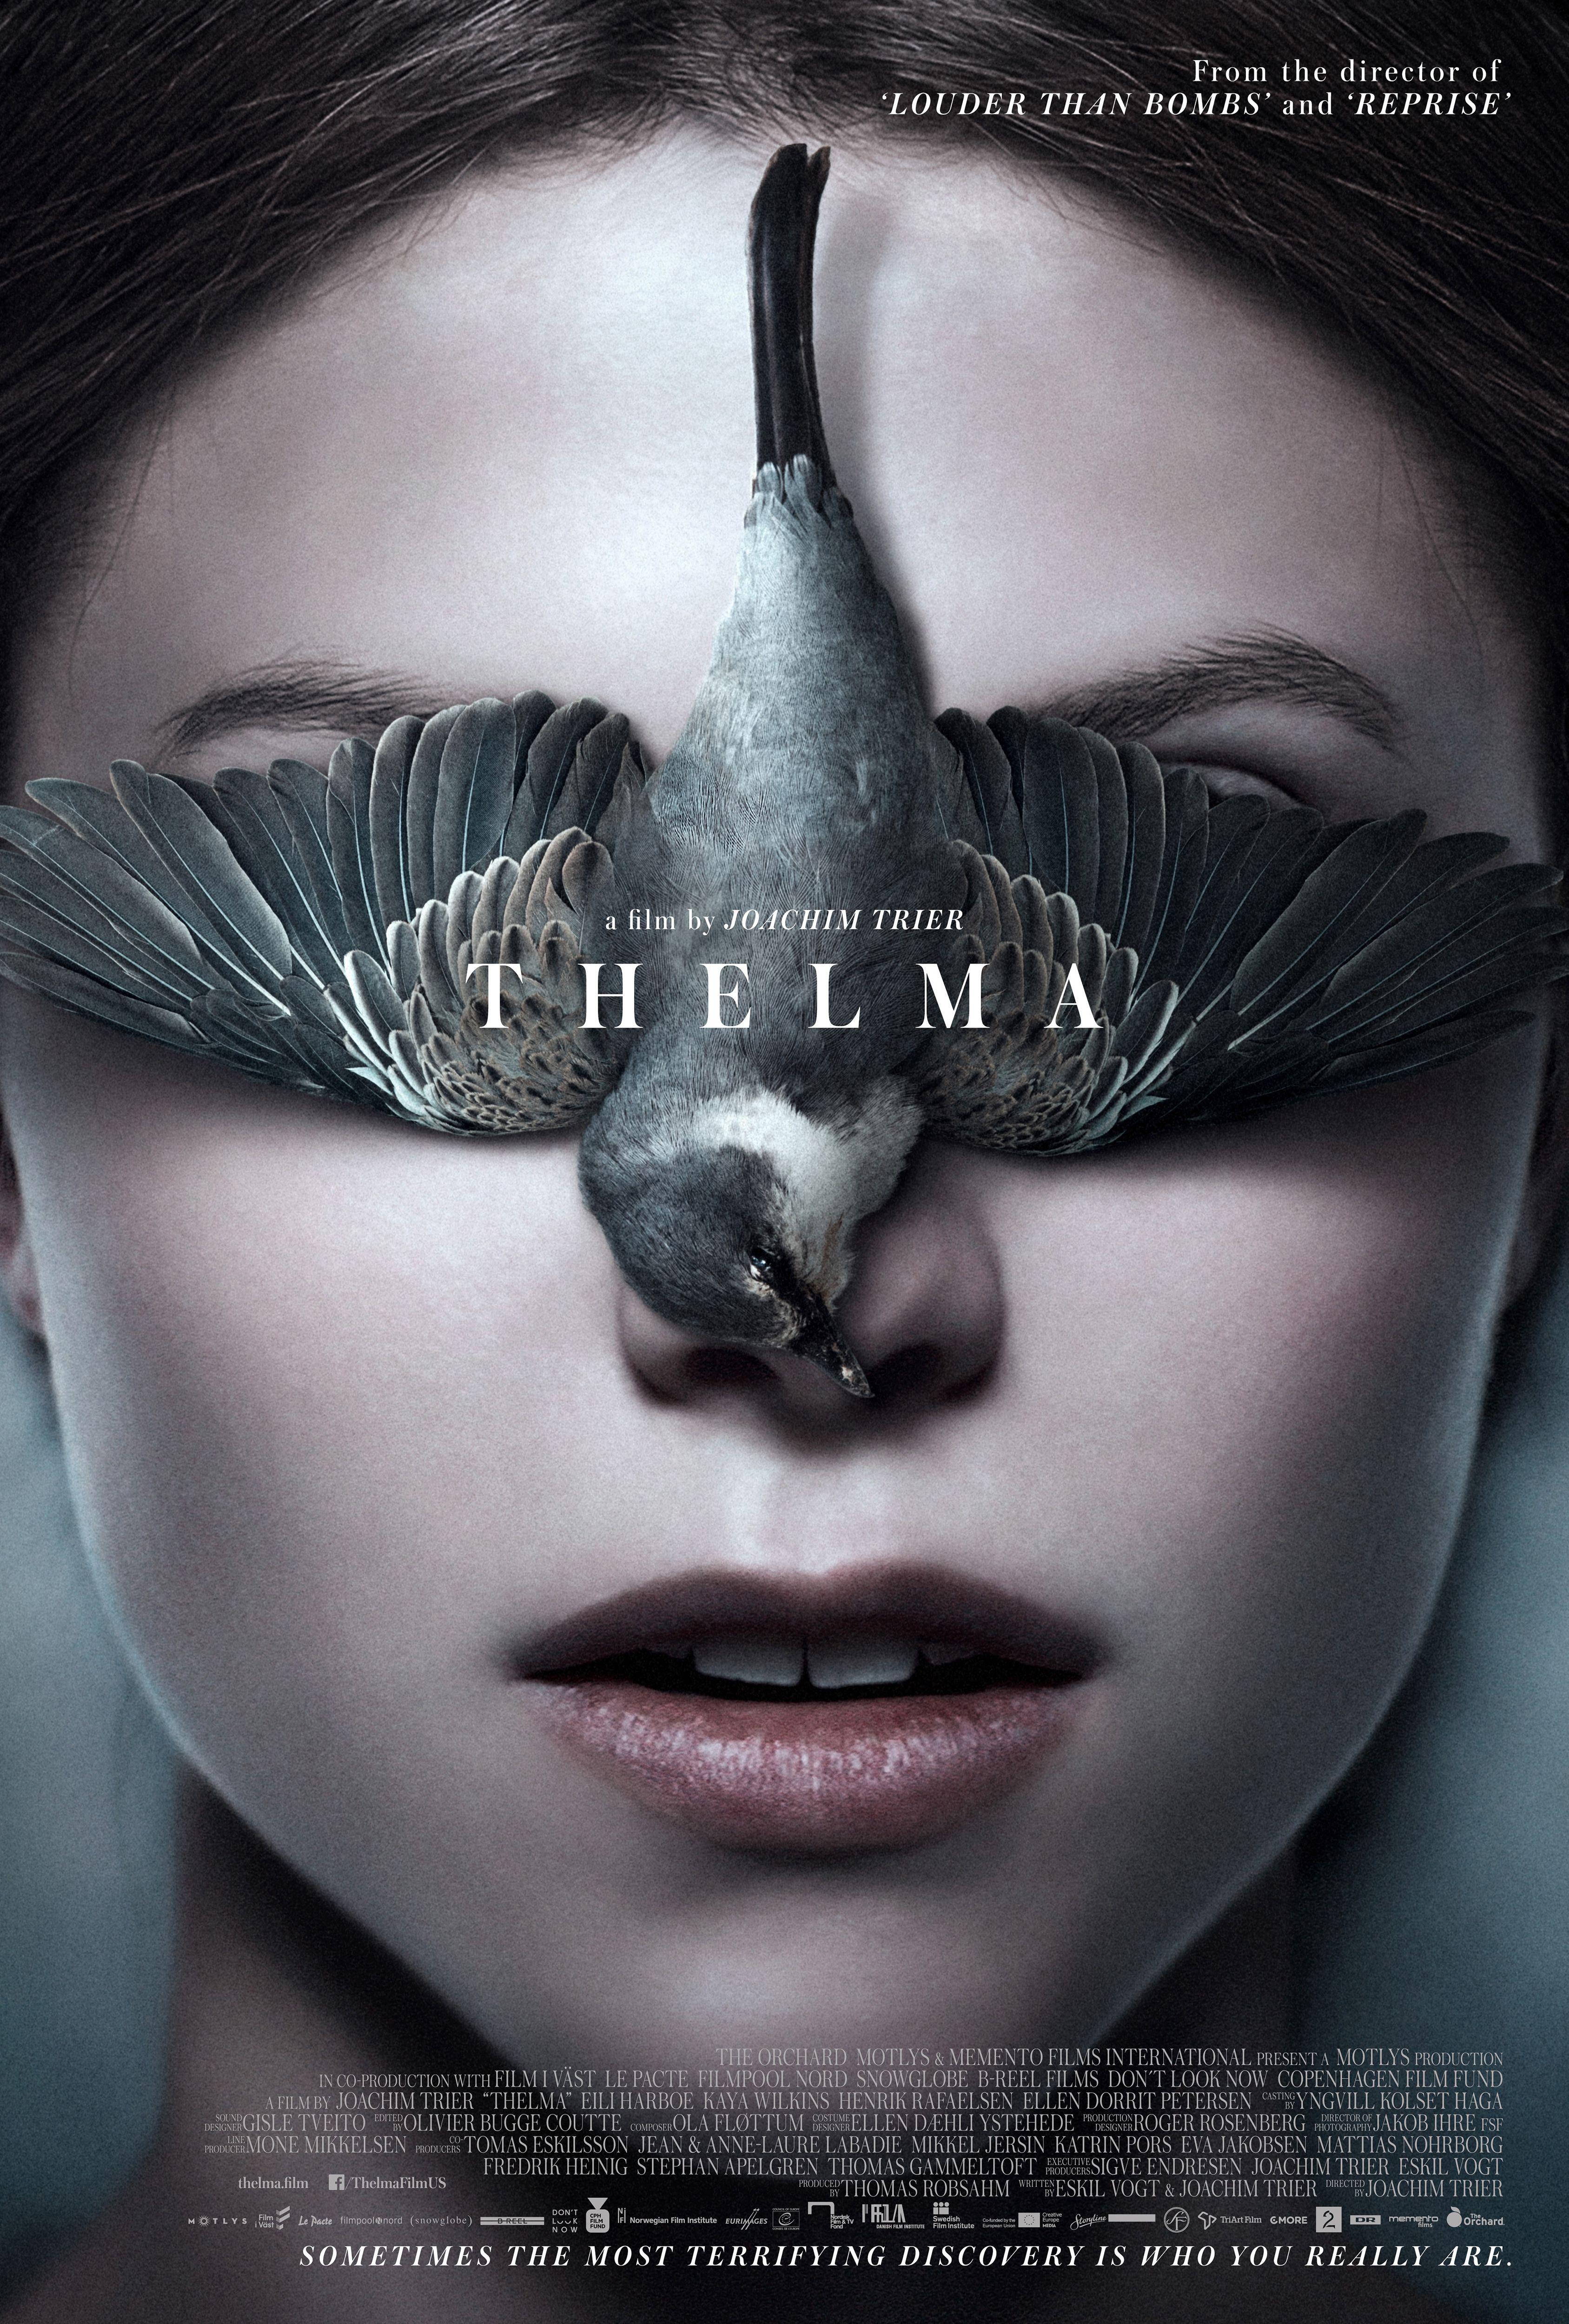 Thelma. I think I found my new favorite film.